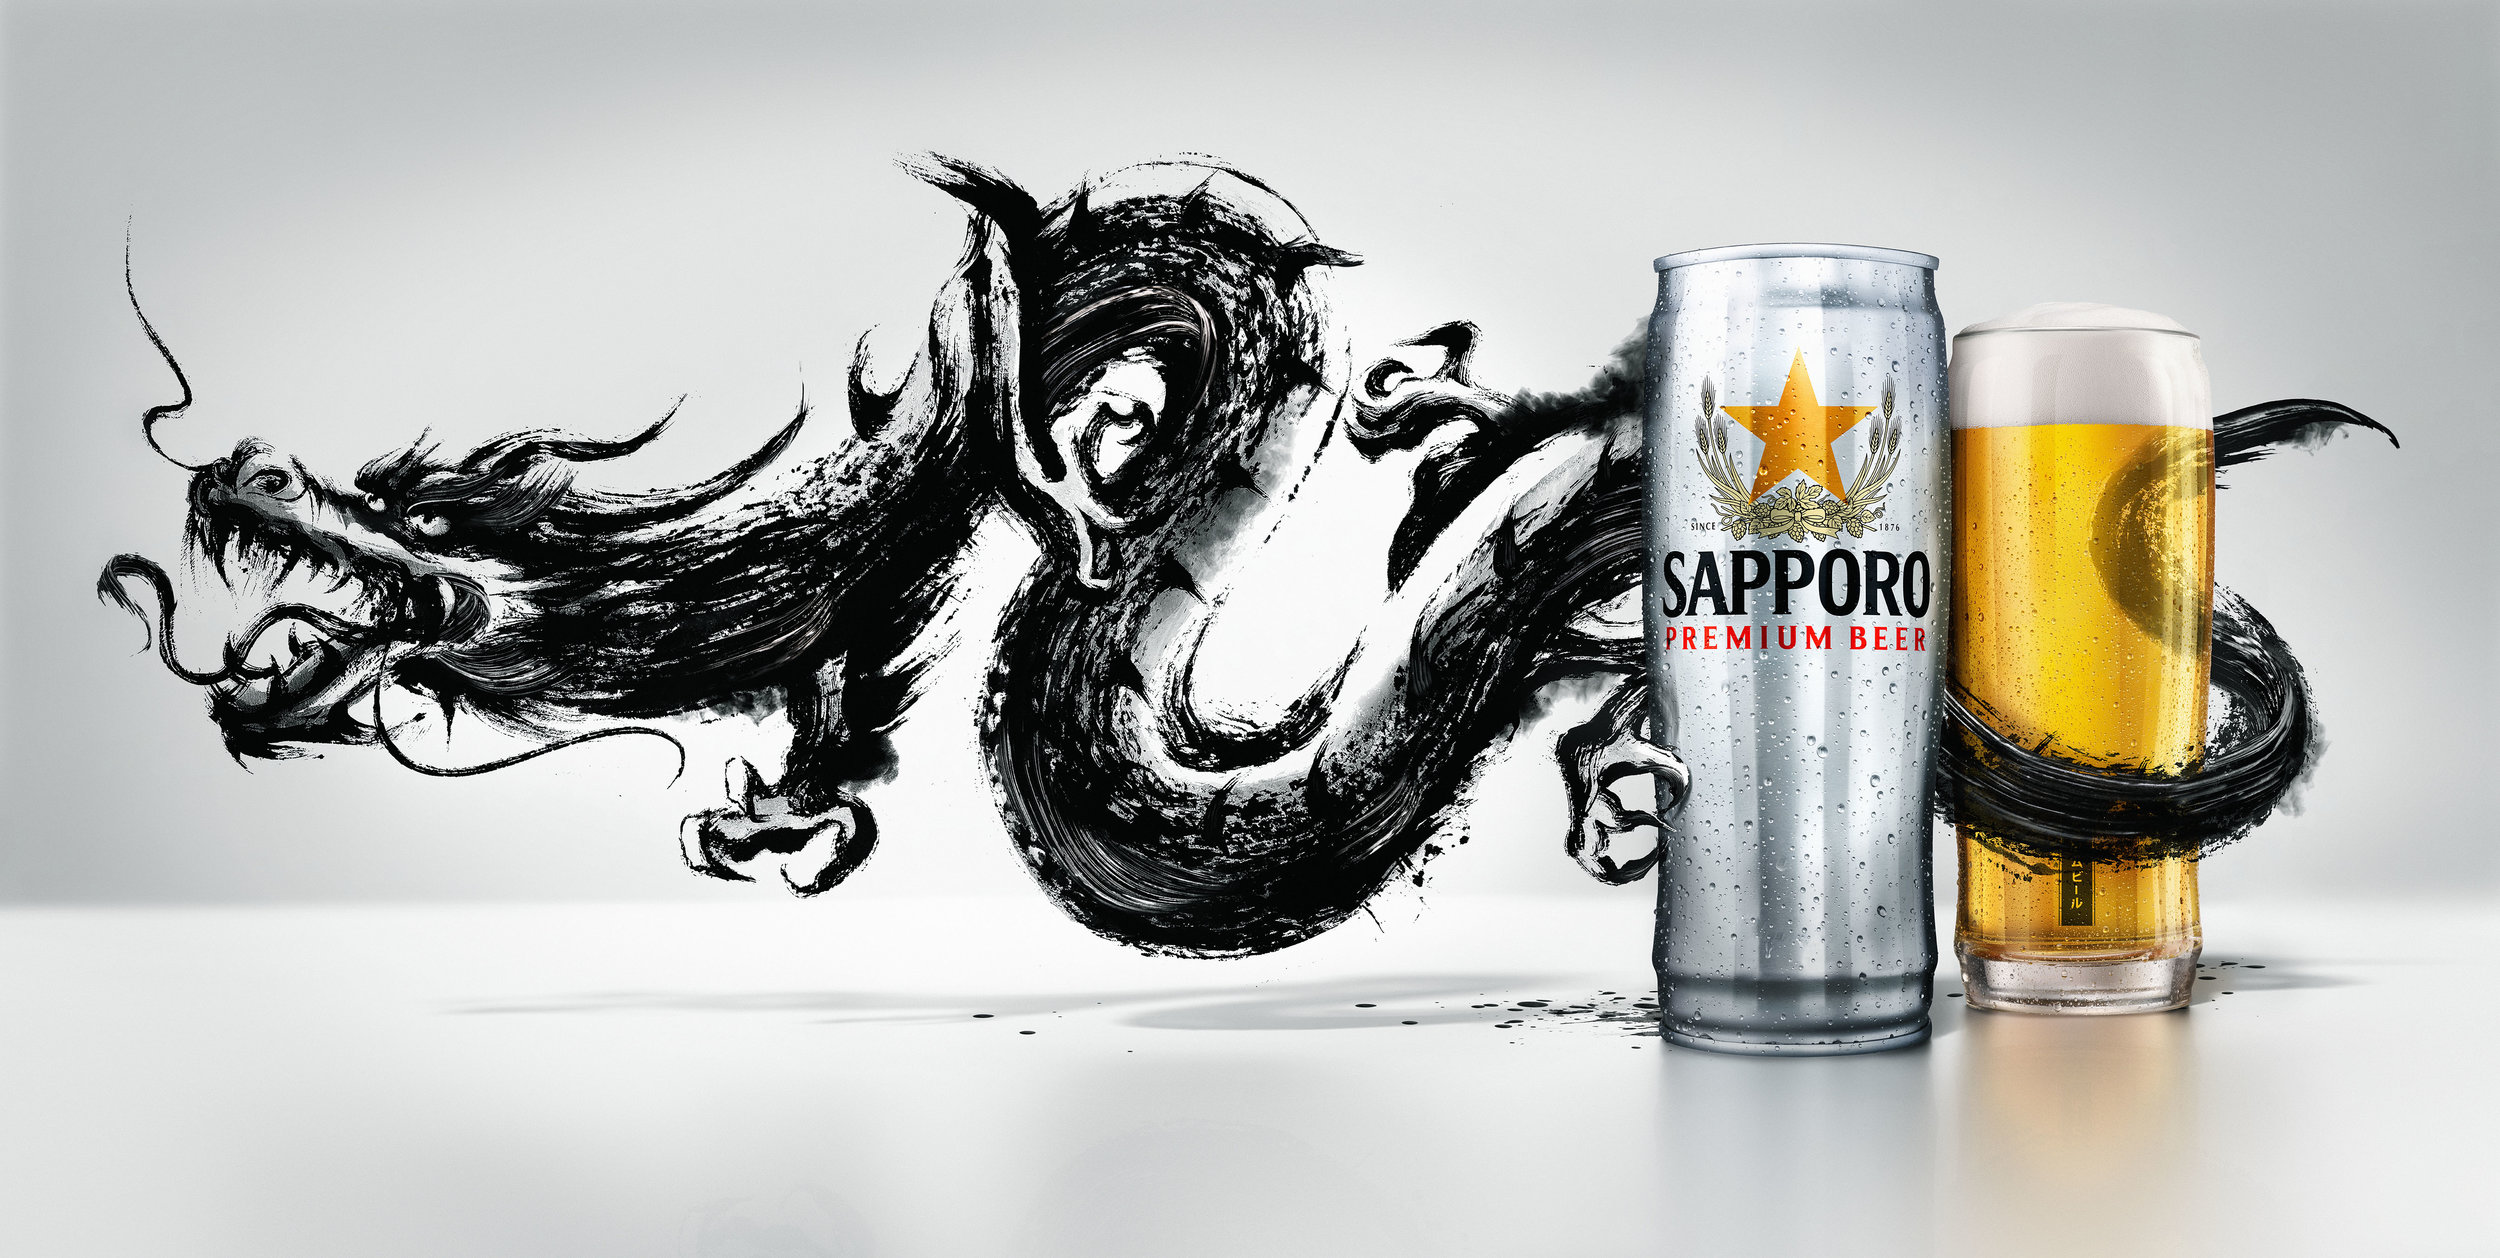 Client • Sapporo  Agency • Dentsu  Art Director • Kyle Scotland  CGI • Brad Pickard